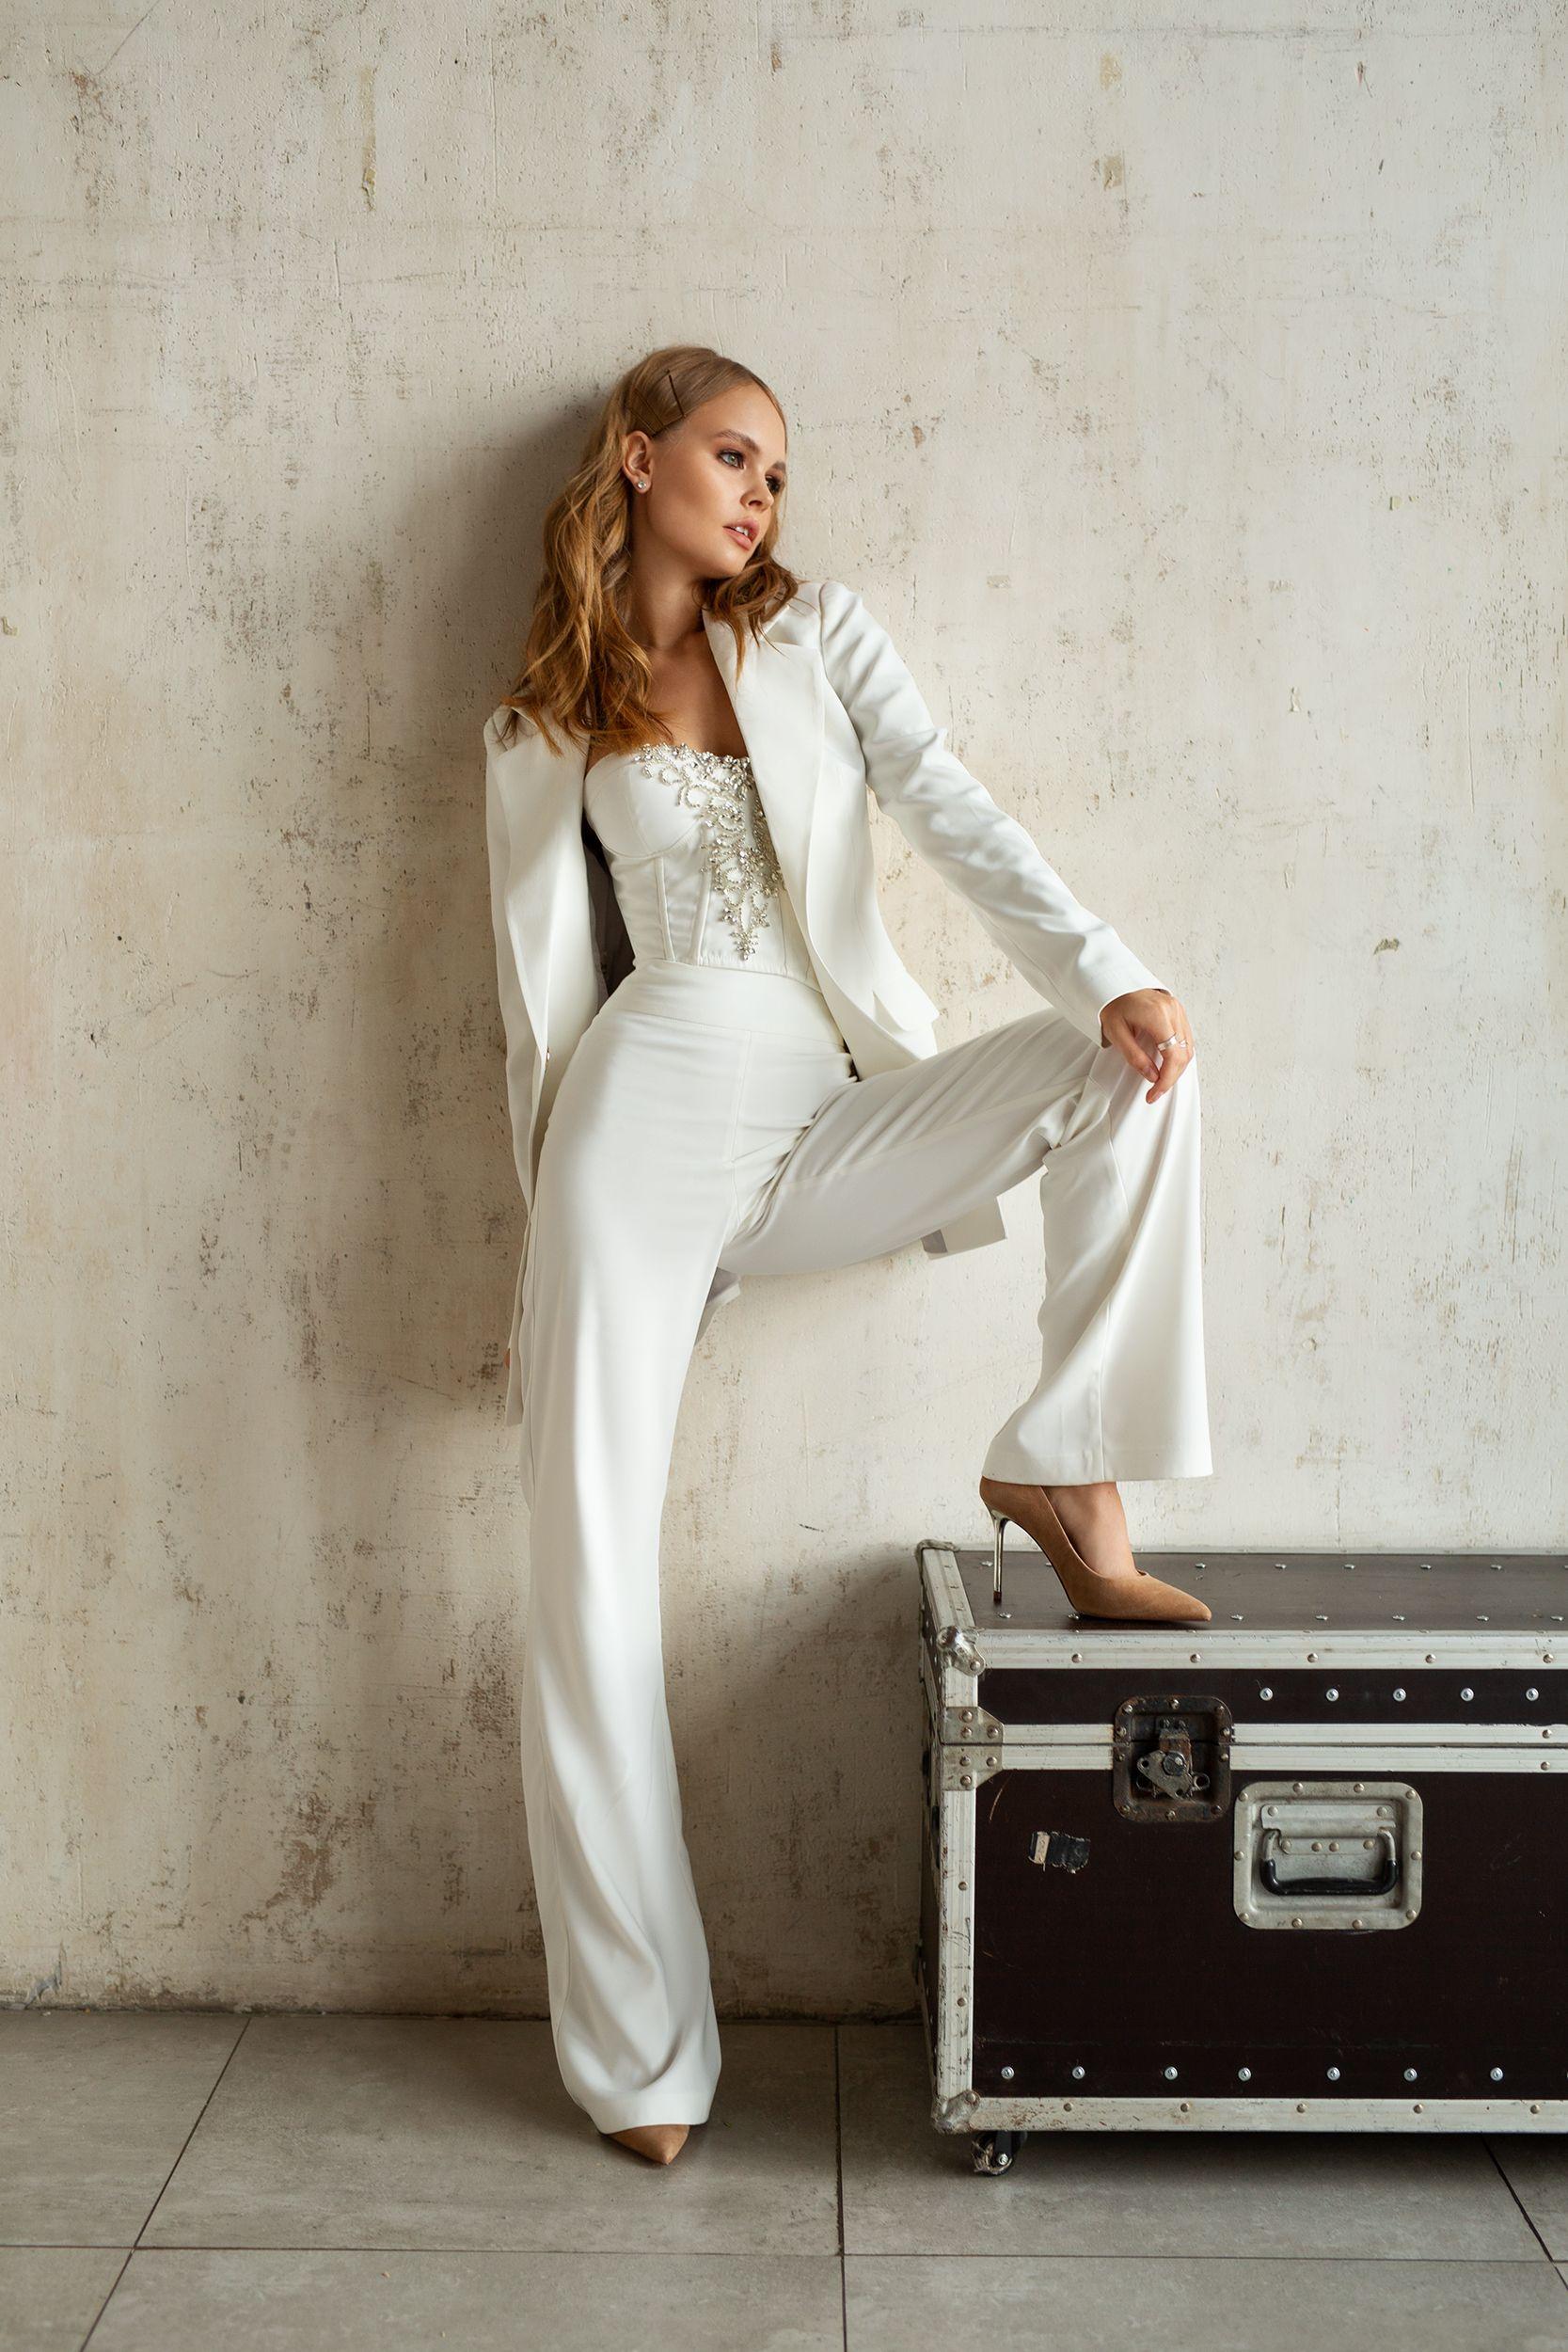 Laceeis Corset Corset Back Wedding Dress Wedding Dresses Corset Wedding Dresses Lace